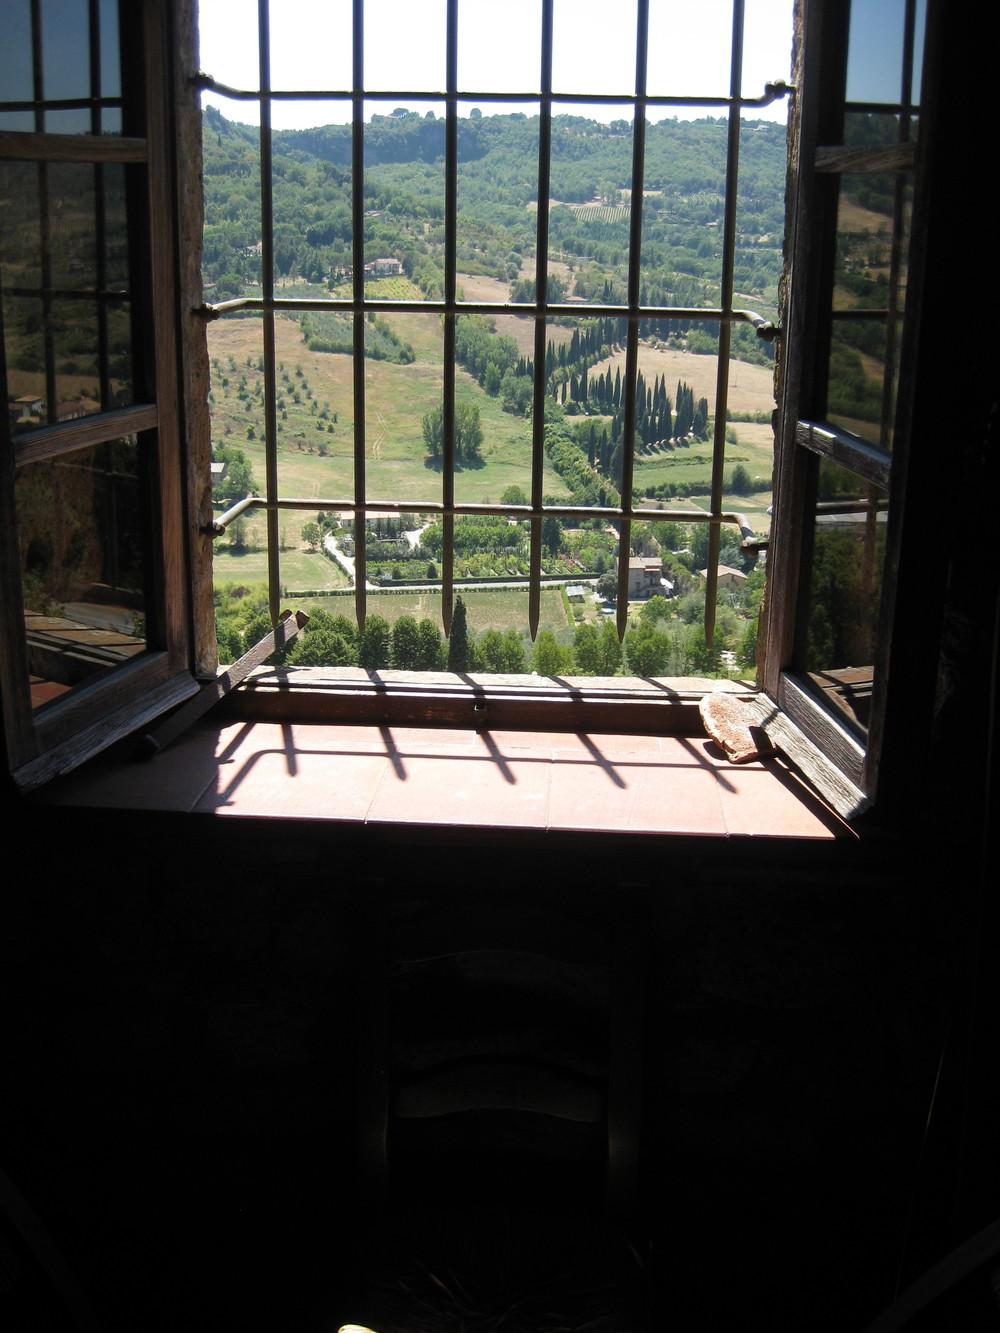 CRO Italy web 2012 - 03.JPG